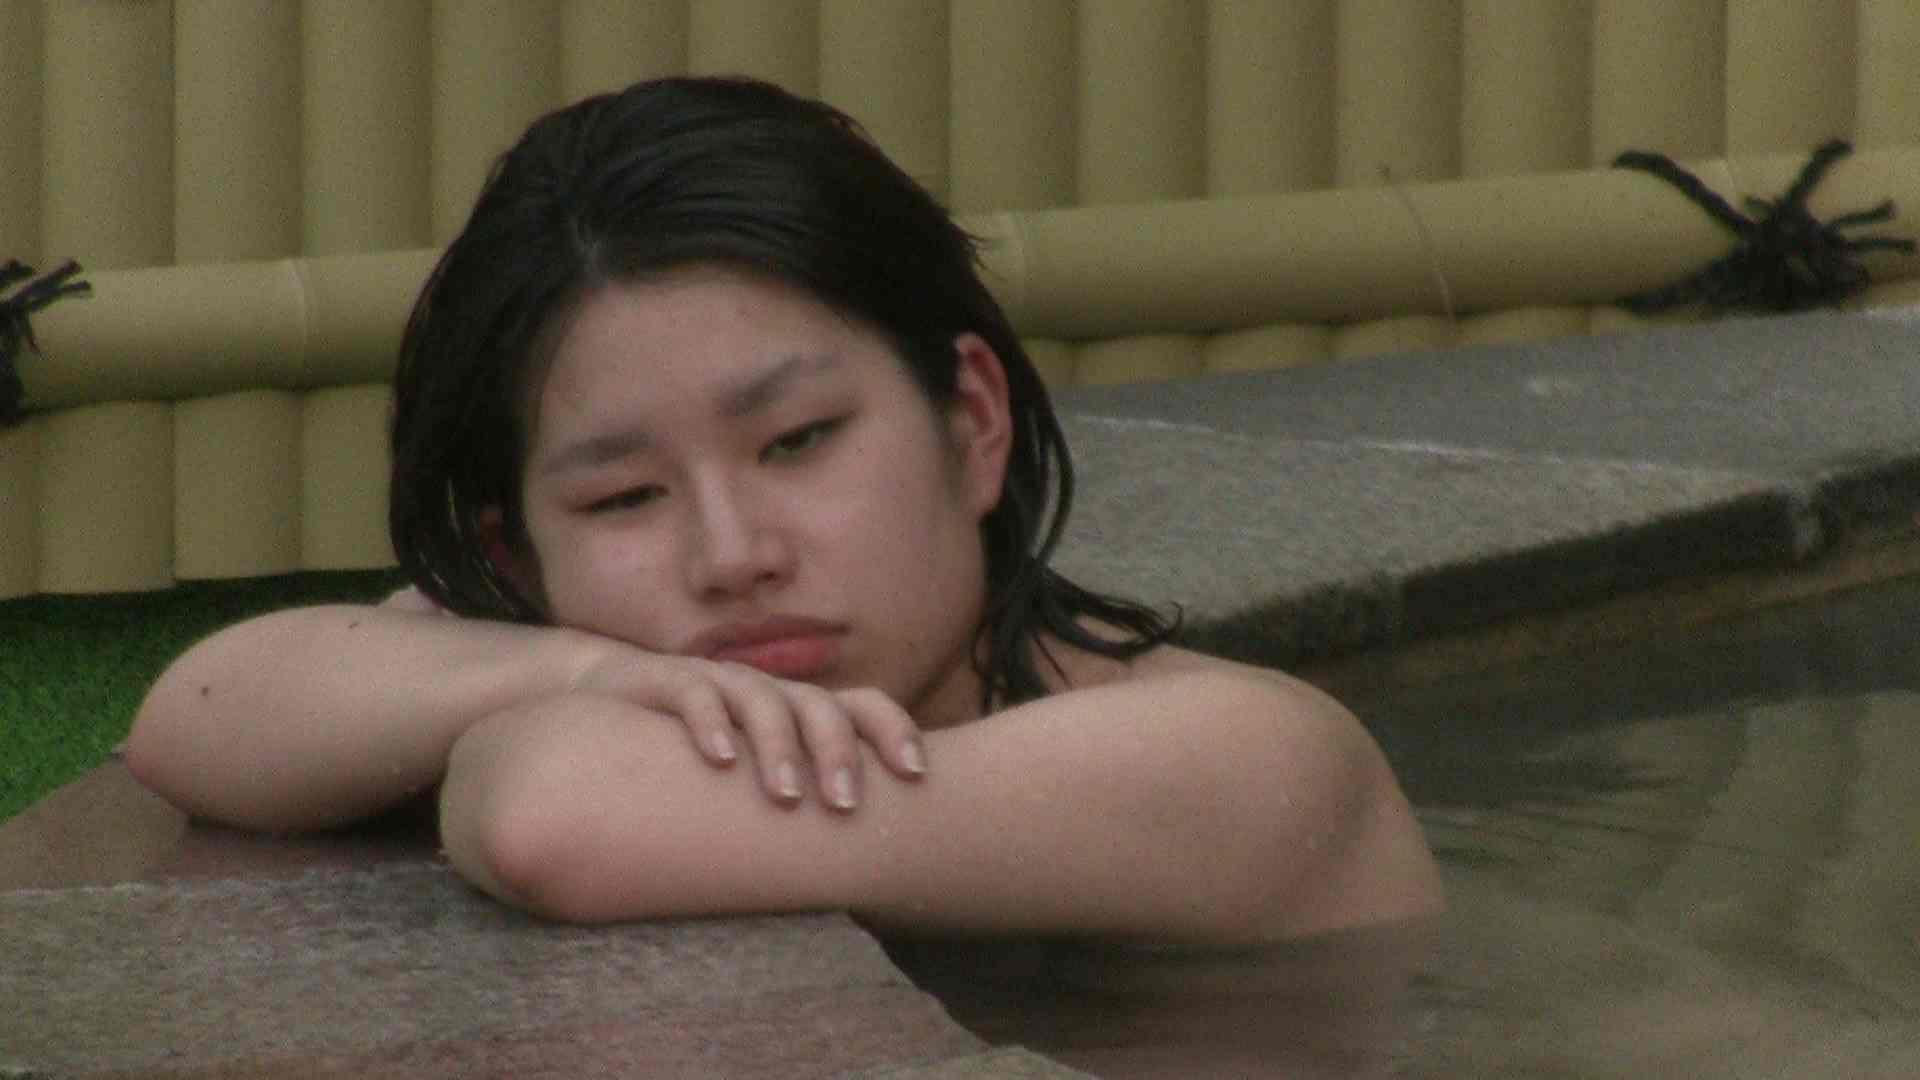 Aquaな露天風呂Vol.230 HなOL | 盗撮  83pic 36